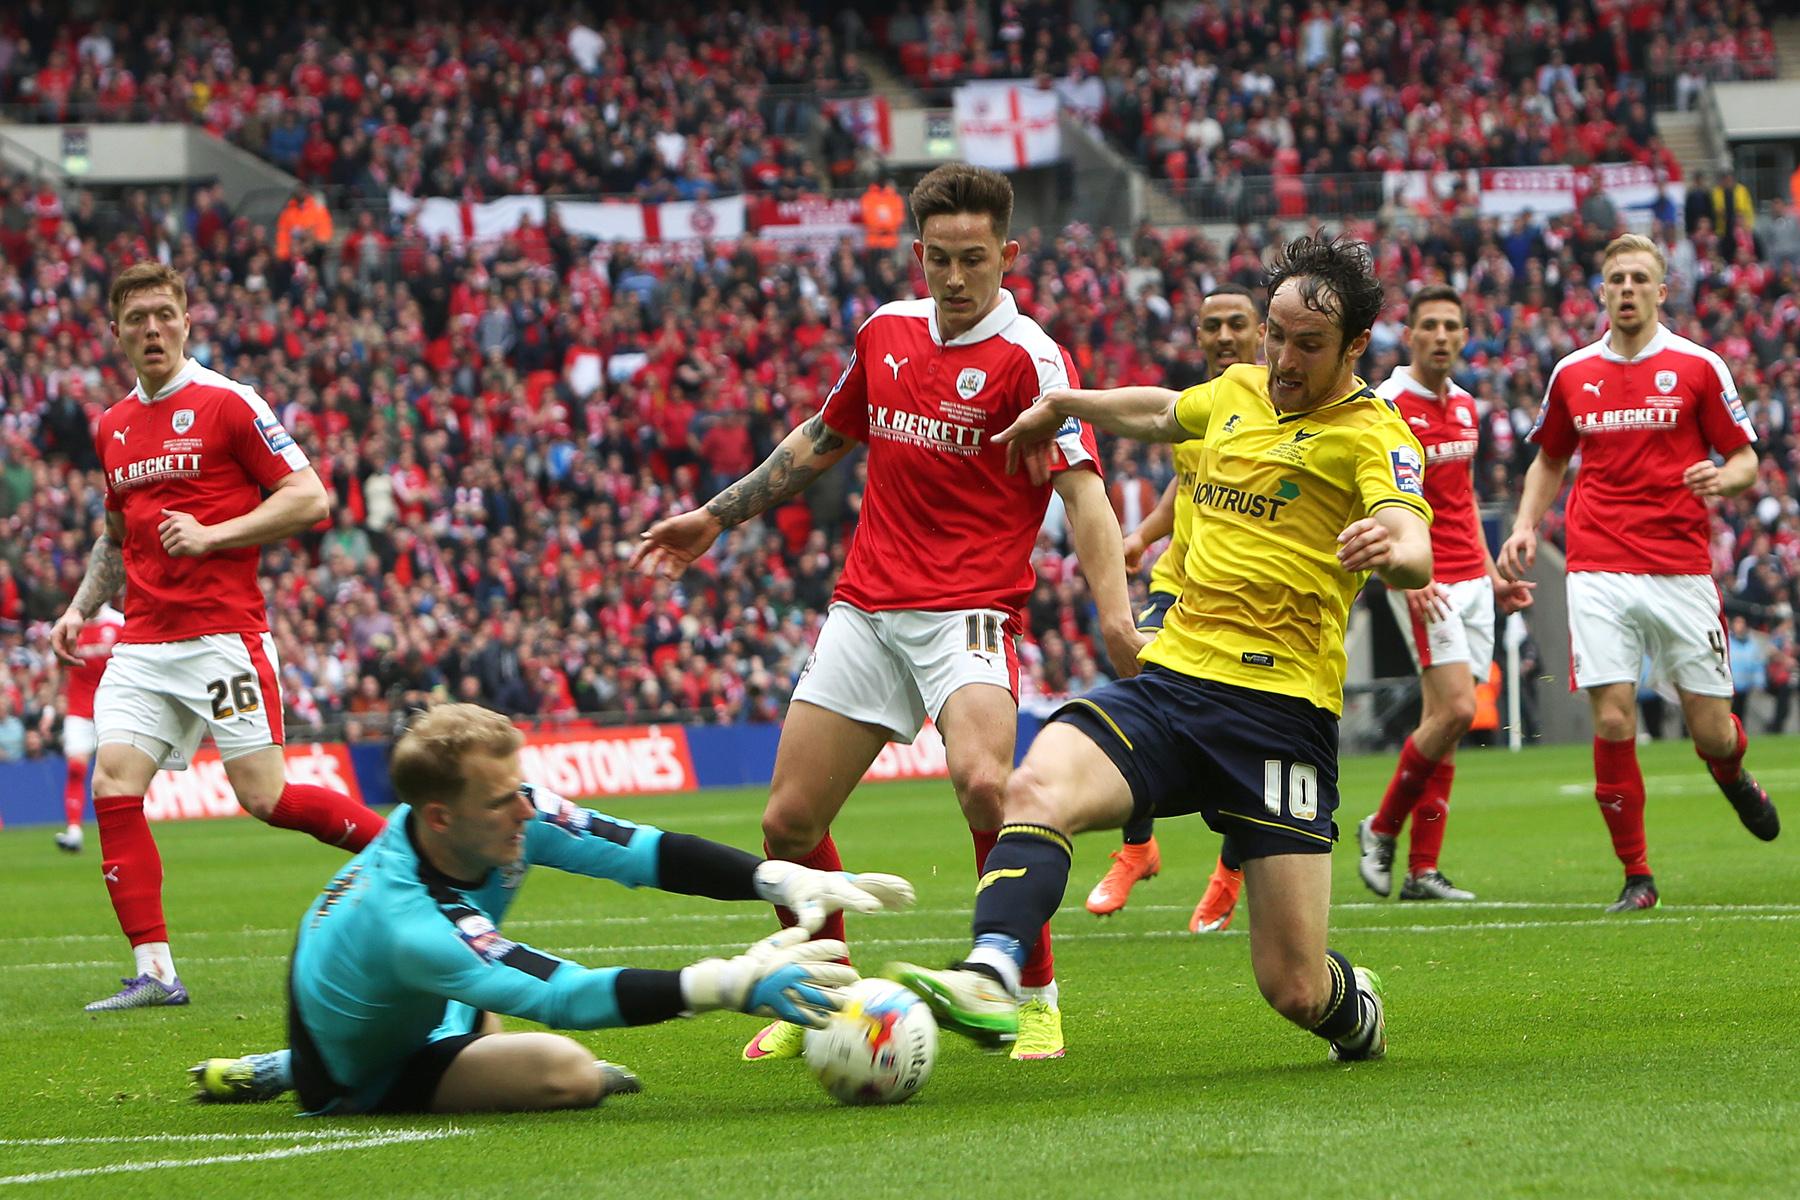 PR_Wembley21.jpg